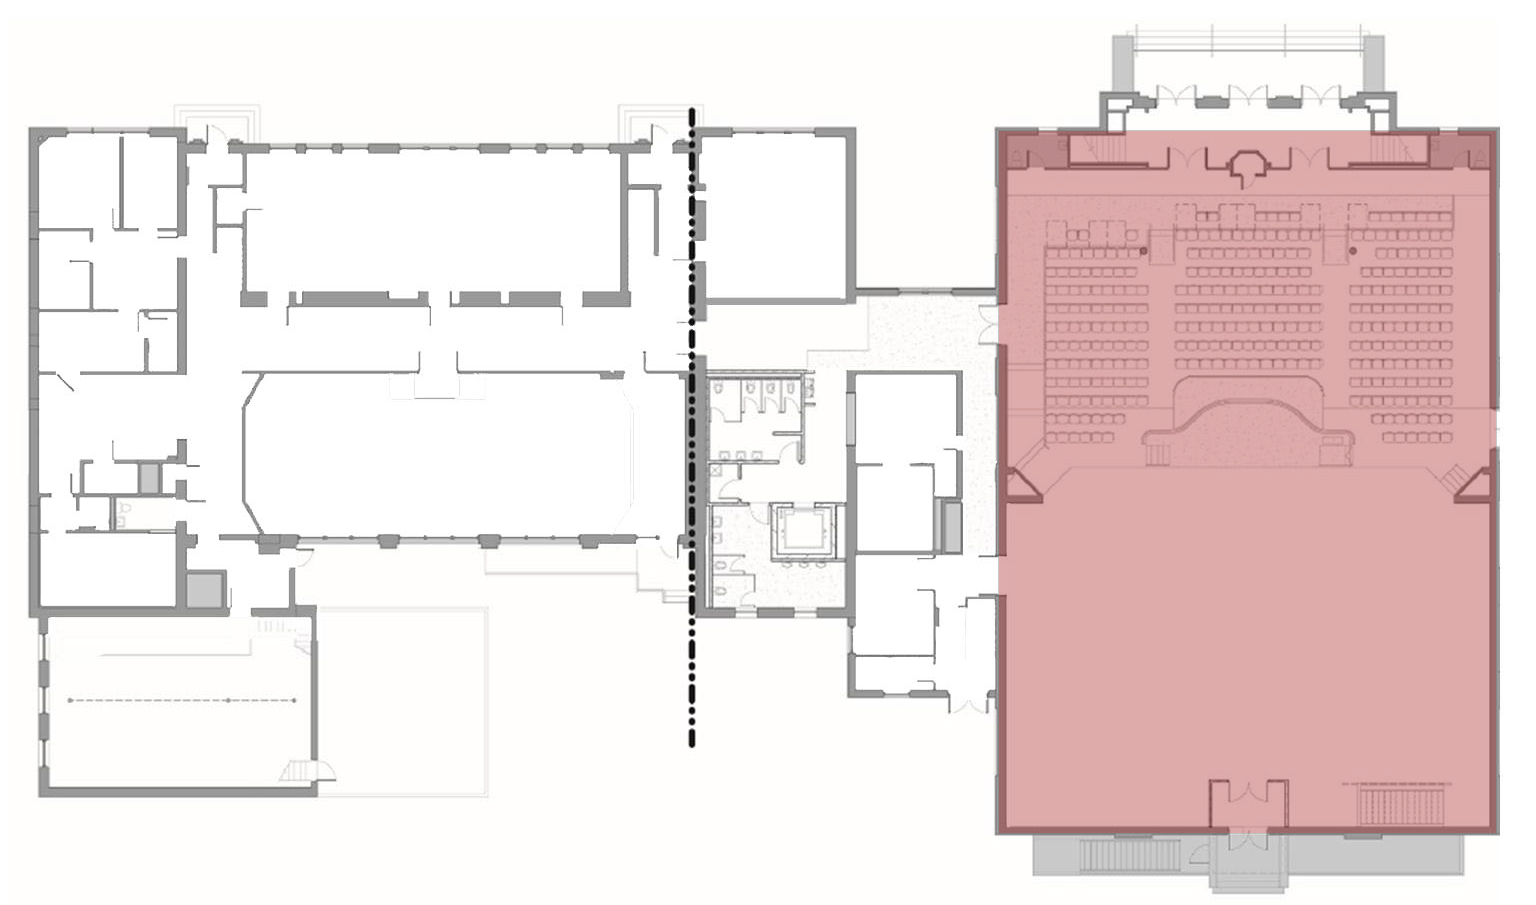 potter floorplan.jpg